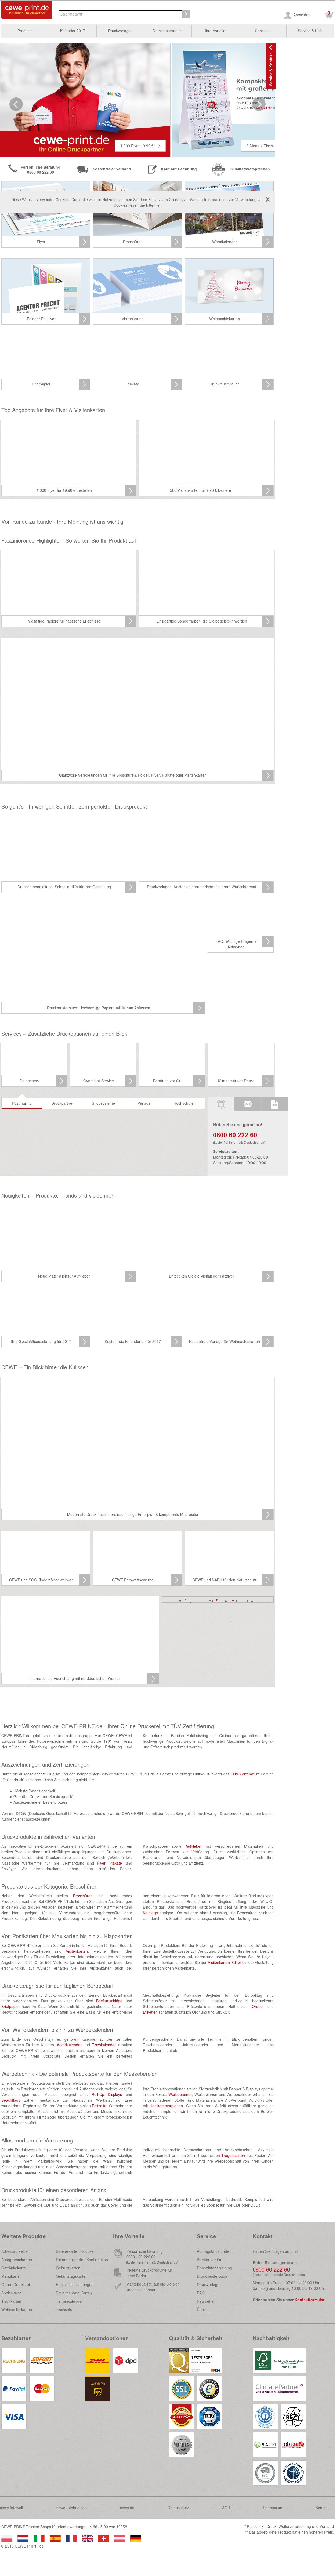 Atemberaubend Akc Zertifizierung Galerie - zertifizierungsstelle ...